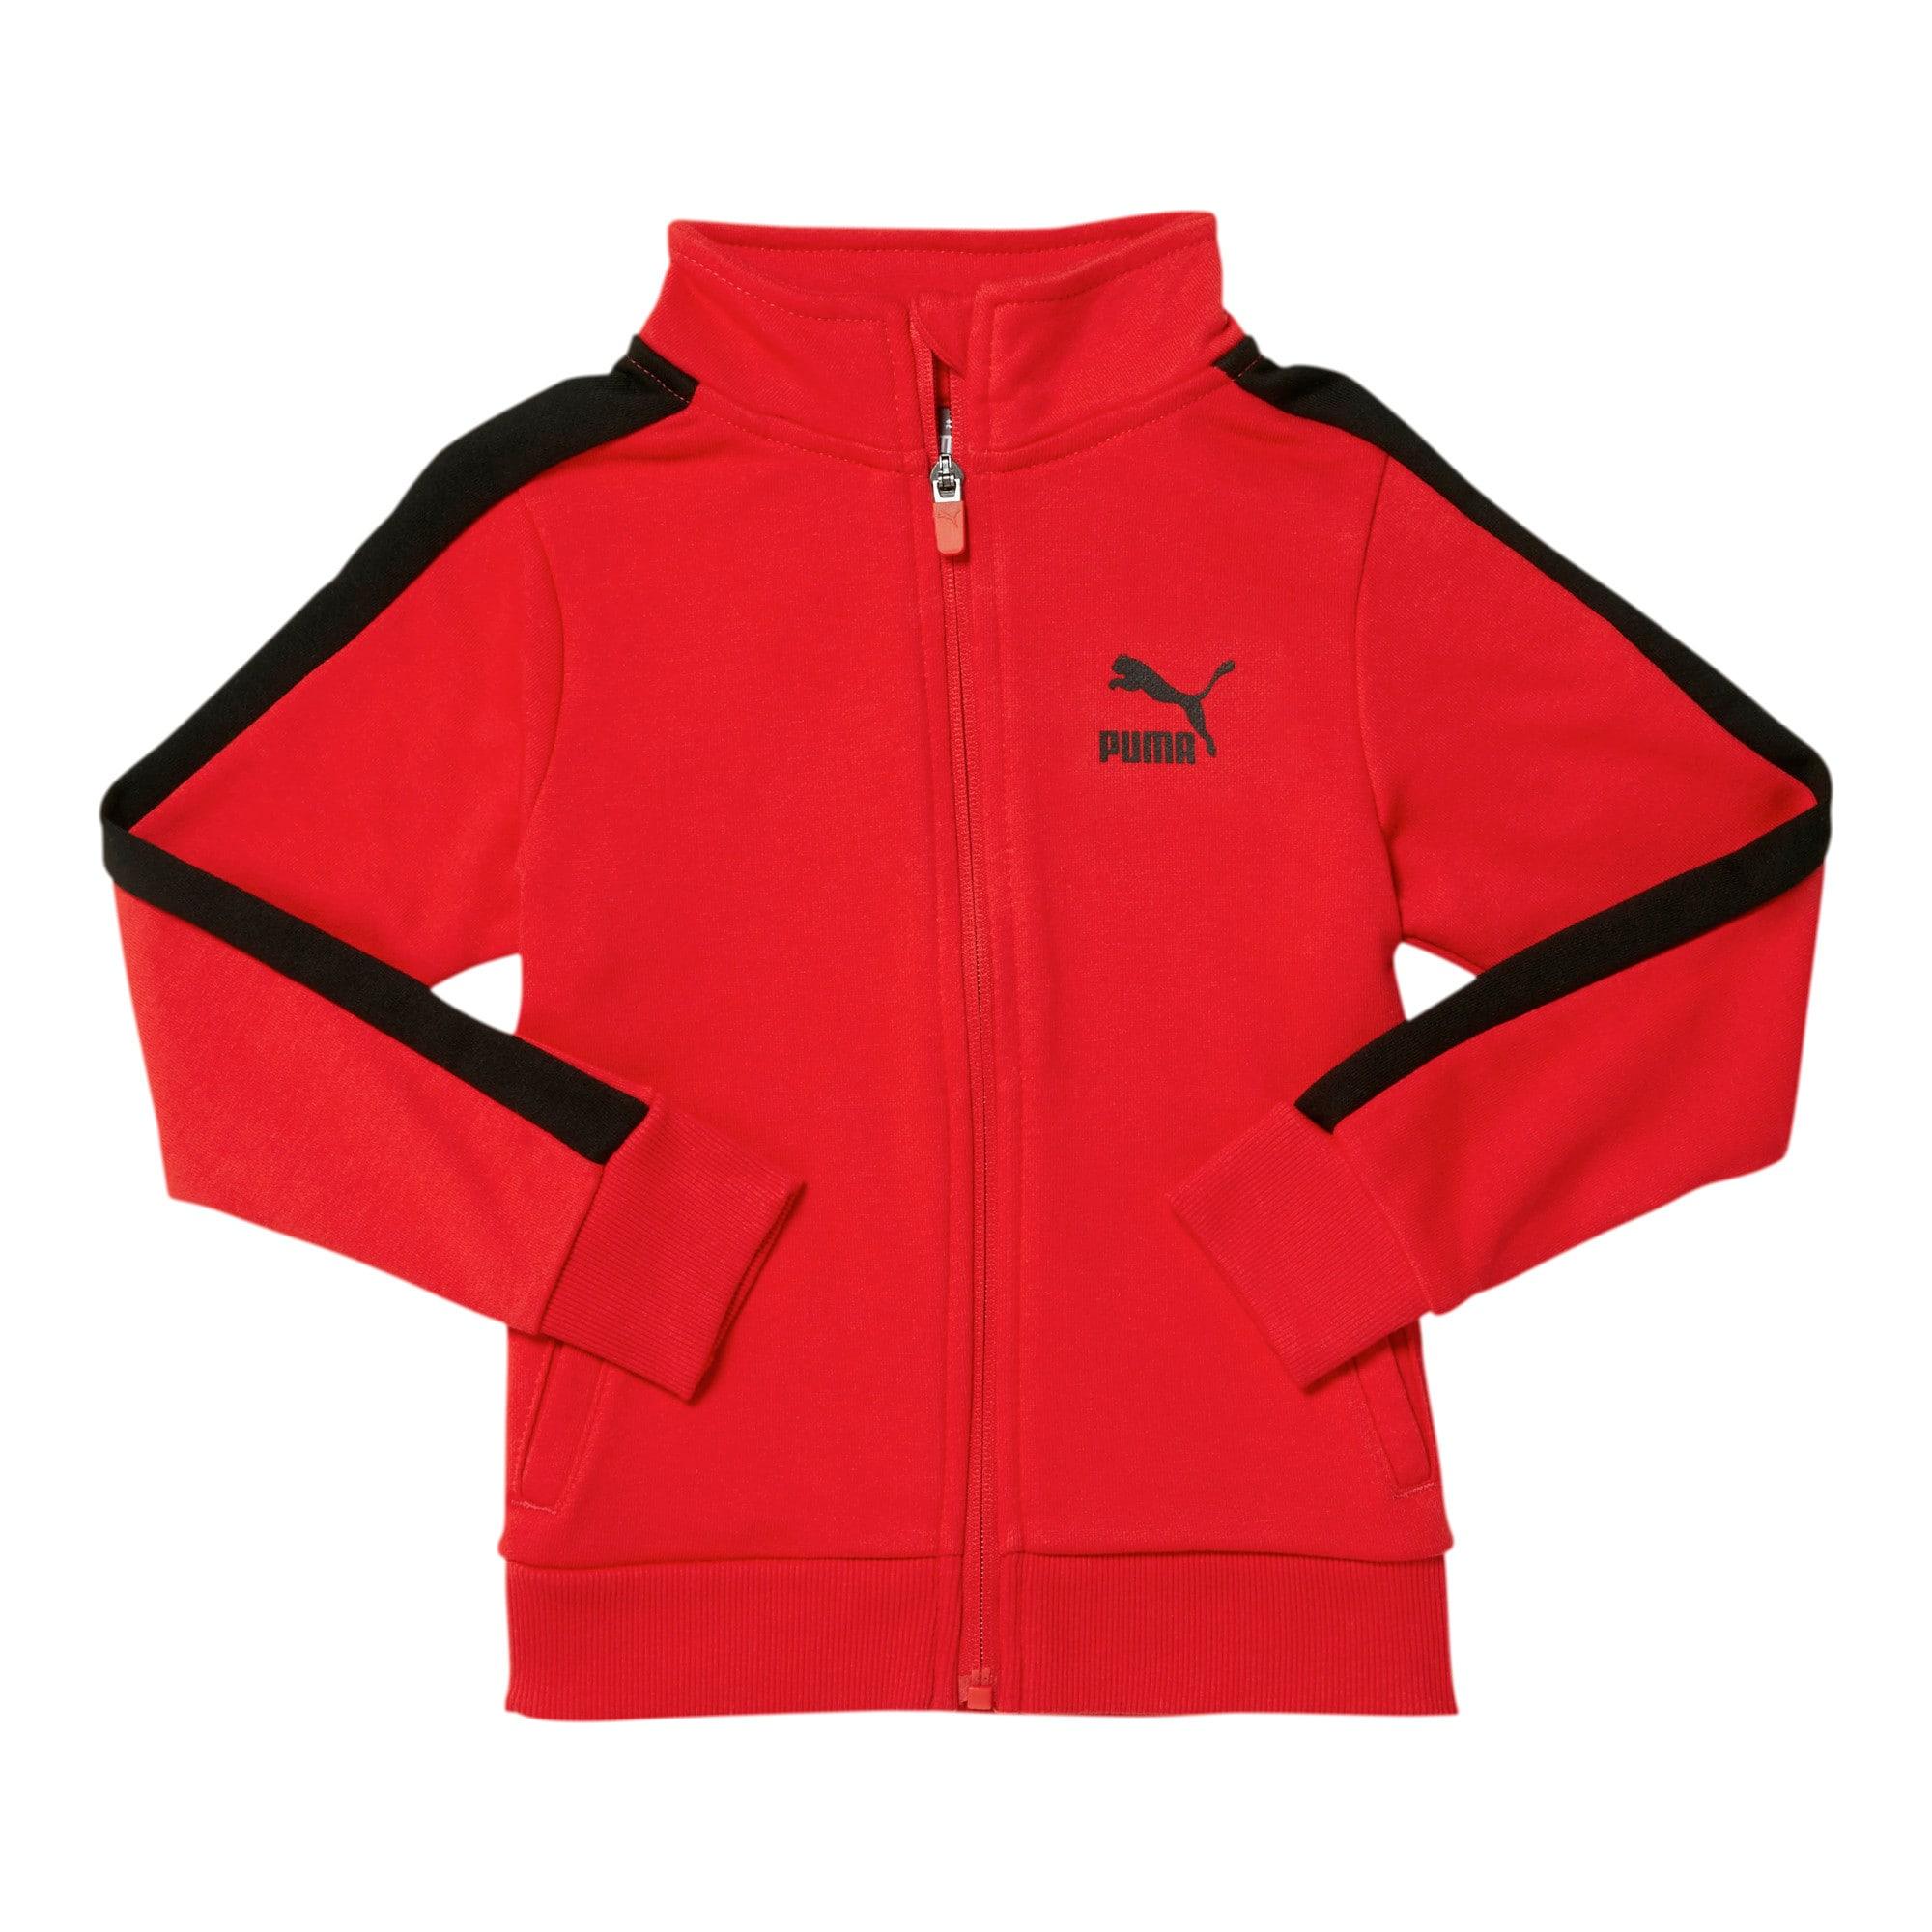 Thumbnail 1 of Little Kids' T7 Track Jacket, HIGH RISK RED, medium